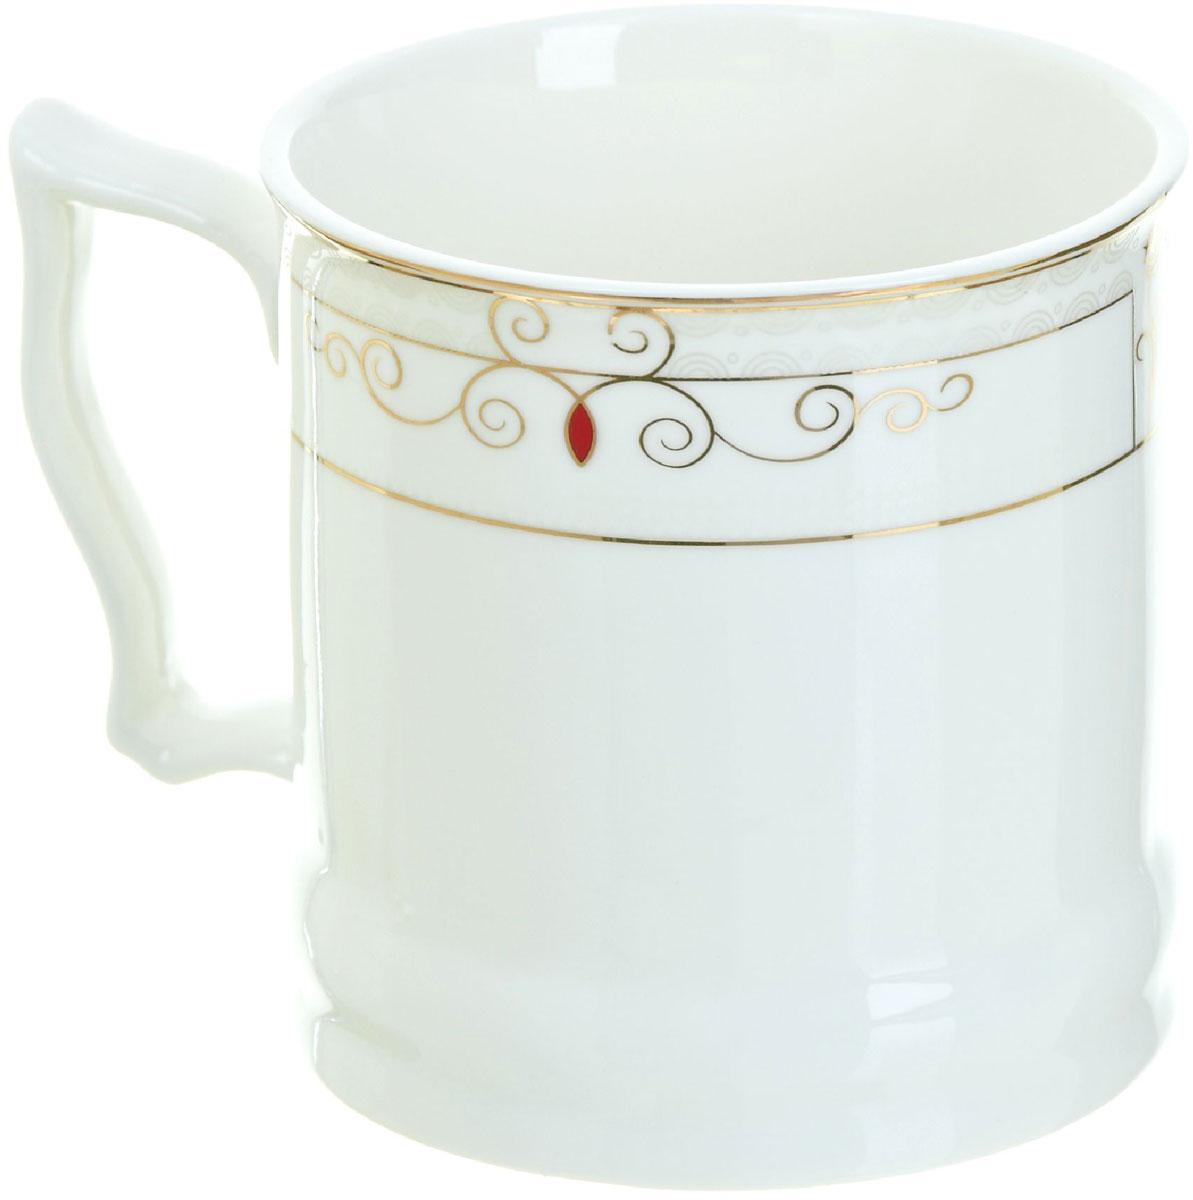 Кружка BHP Королевская кружка, 500 мл. 1870003 кружка amber porcelain сердечки 220 мл